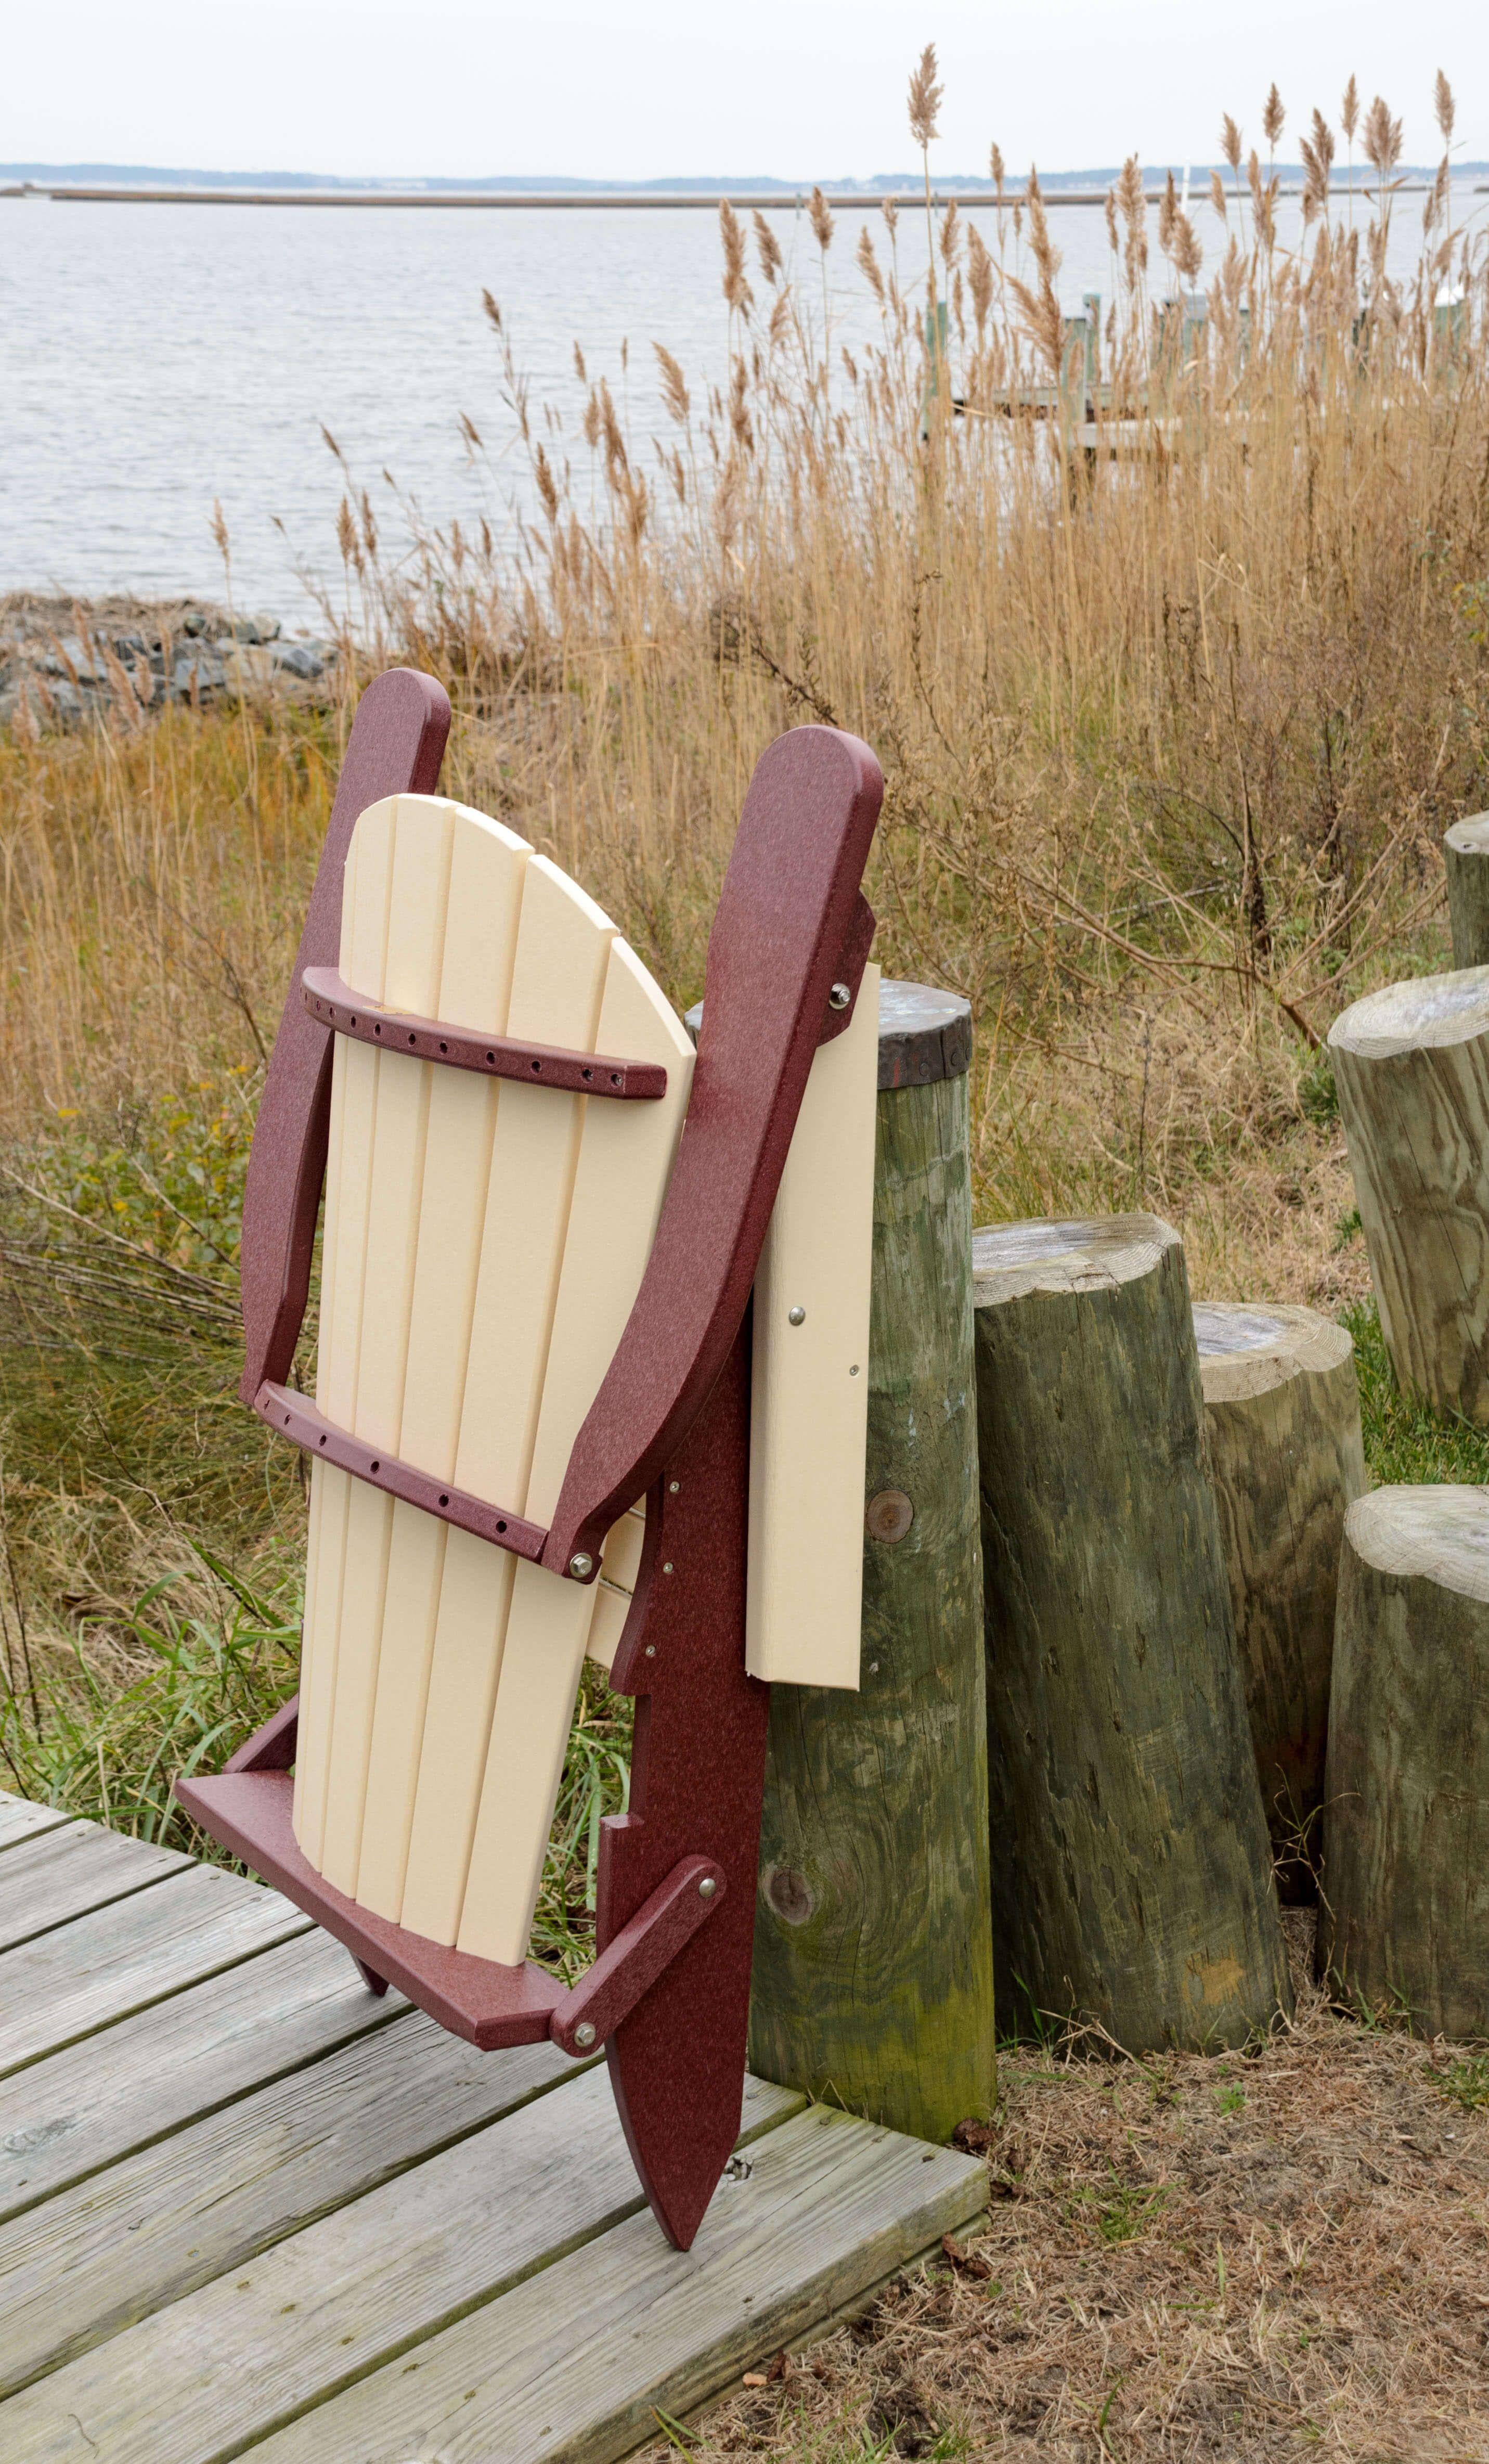 Avalon Folding Adirondack Chair Folded